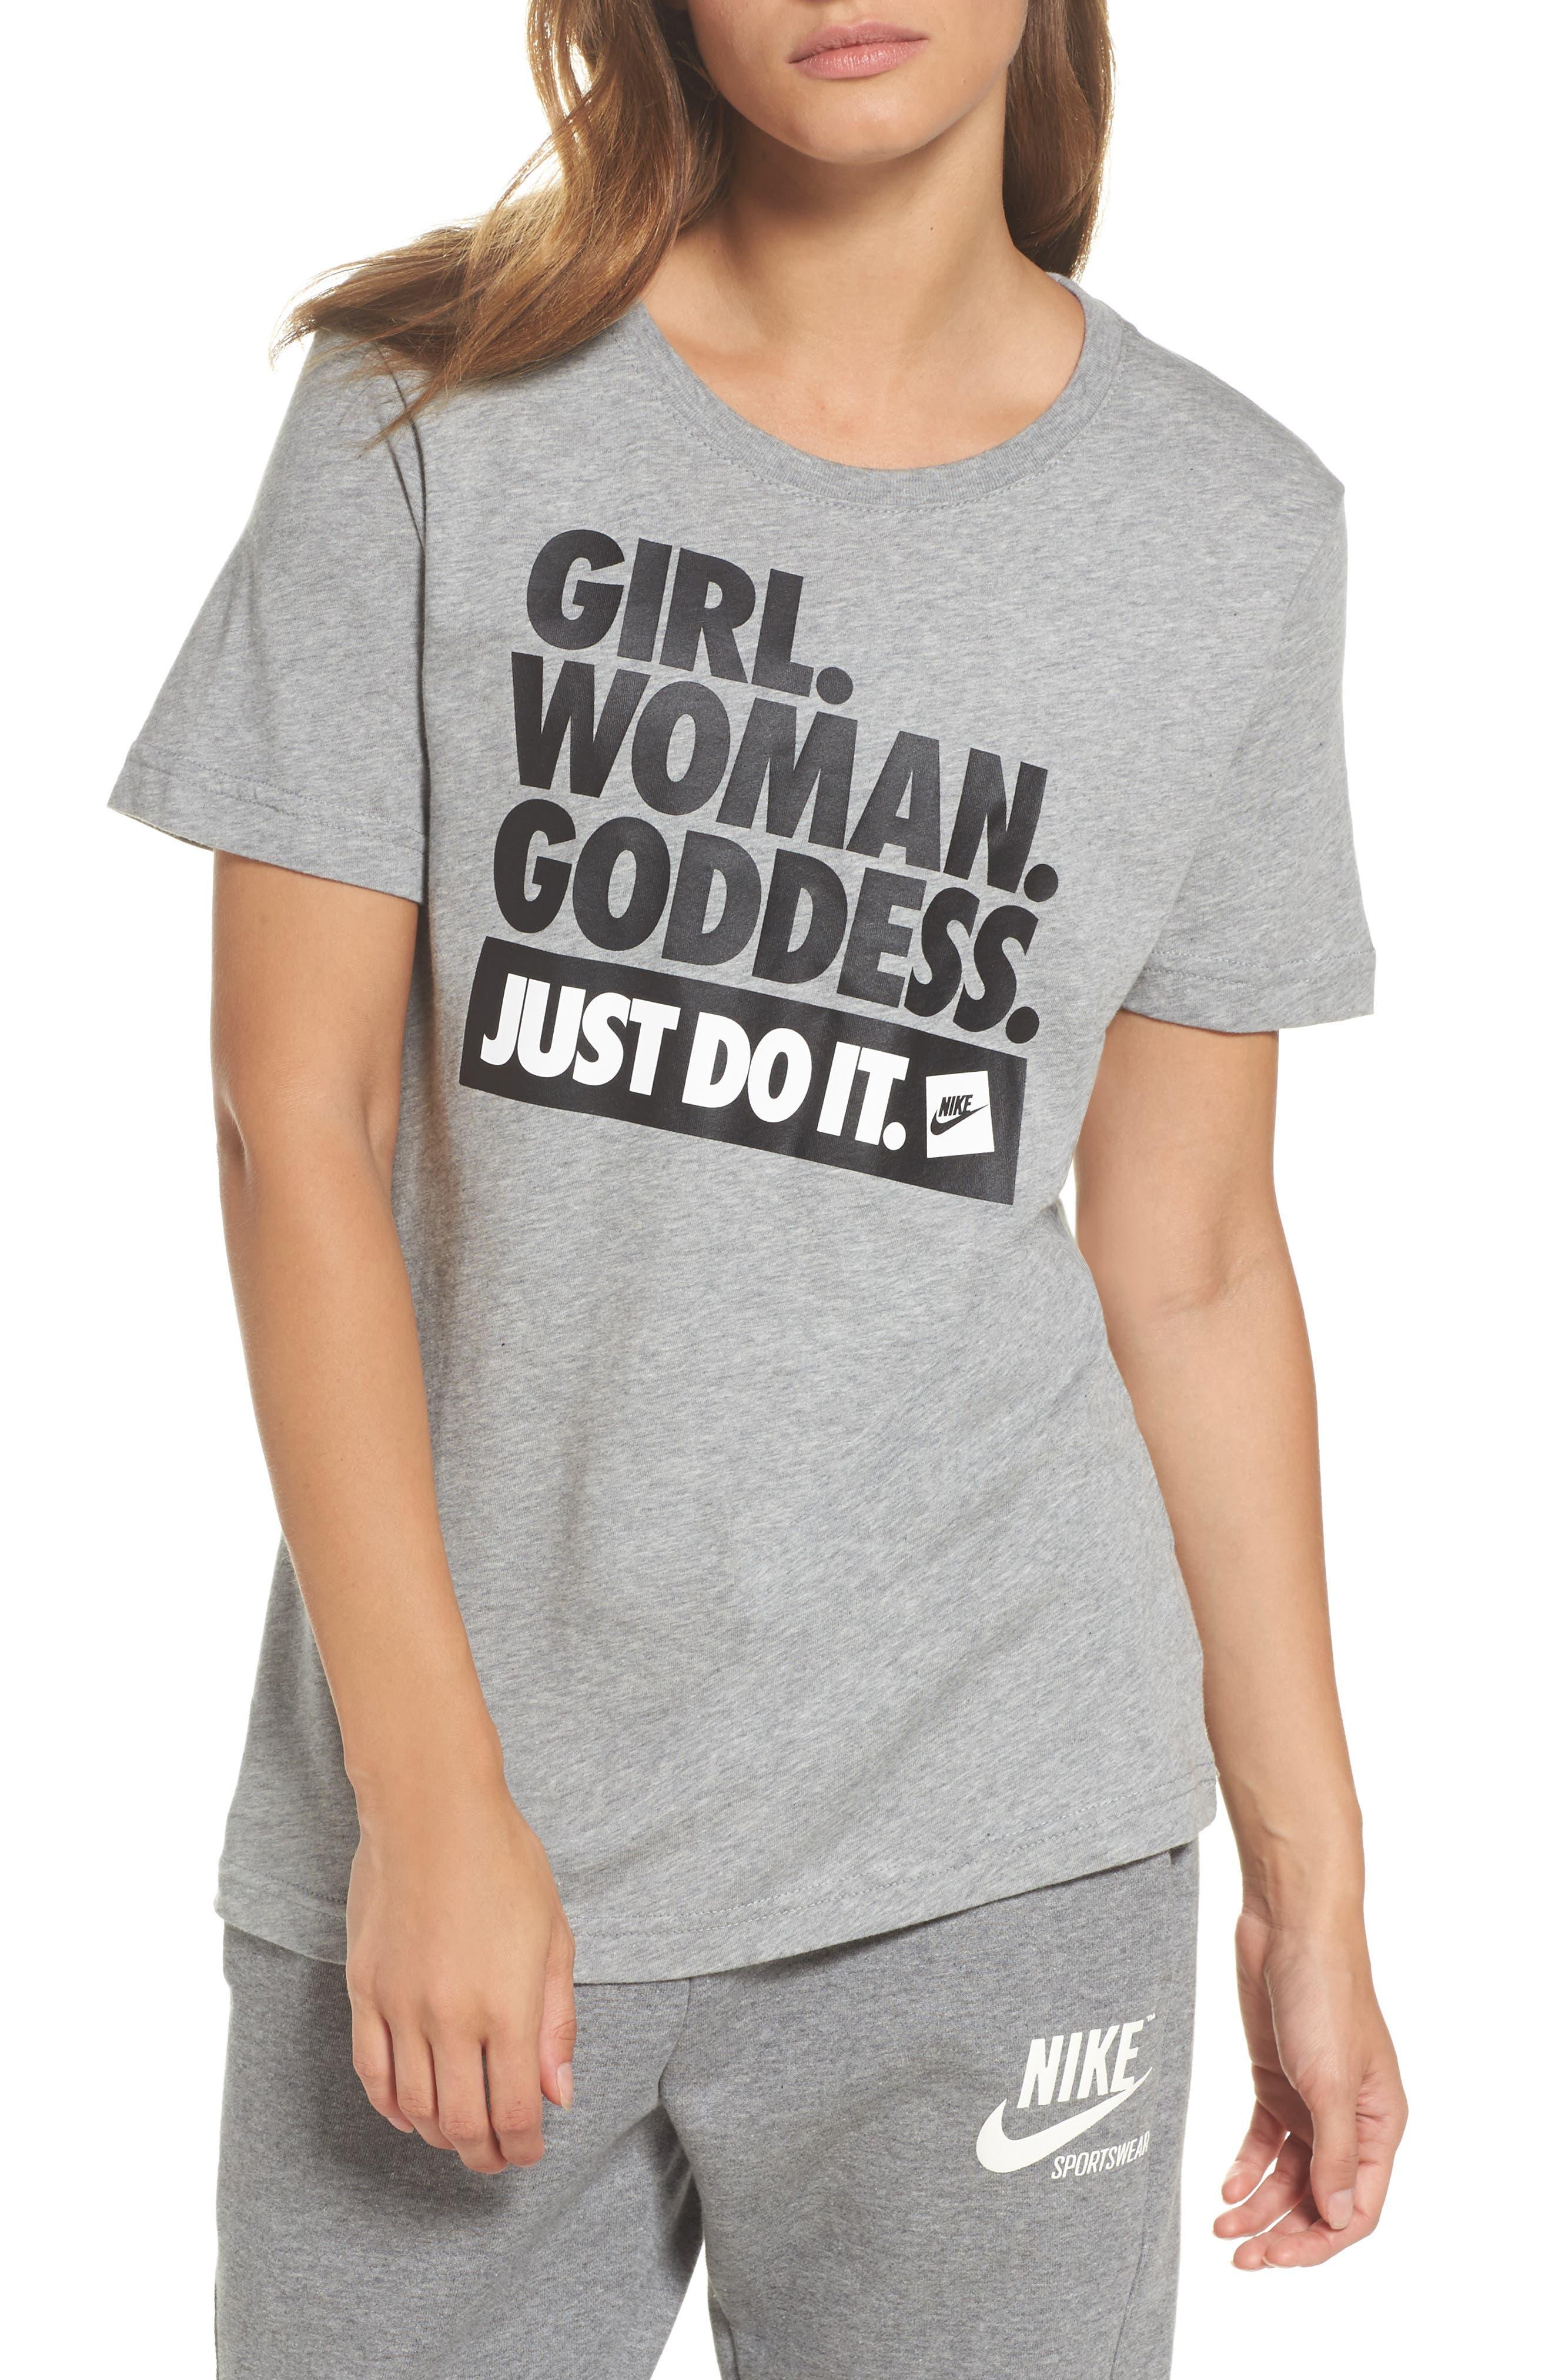 Sportswear Goddess Graphic Tee,                         Main,                         color, Dark Grey Heather/ Black